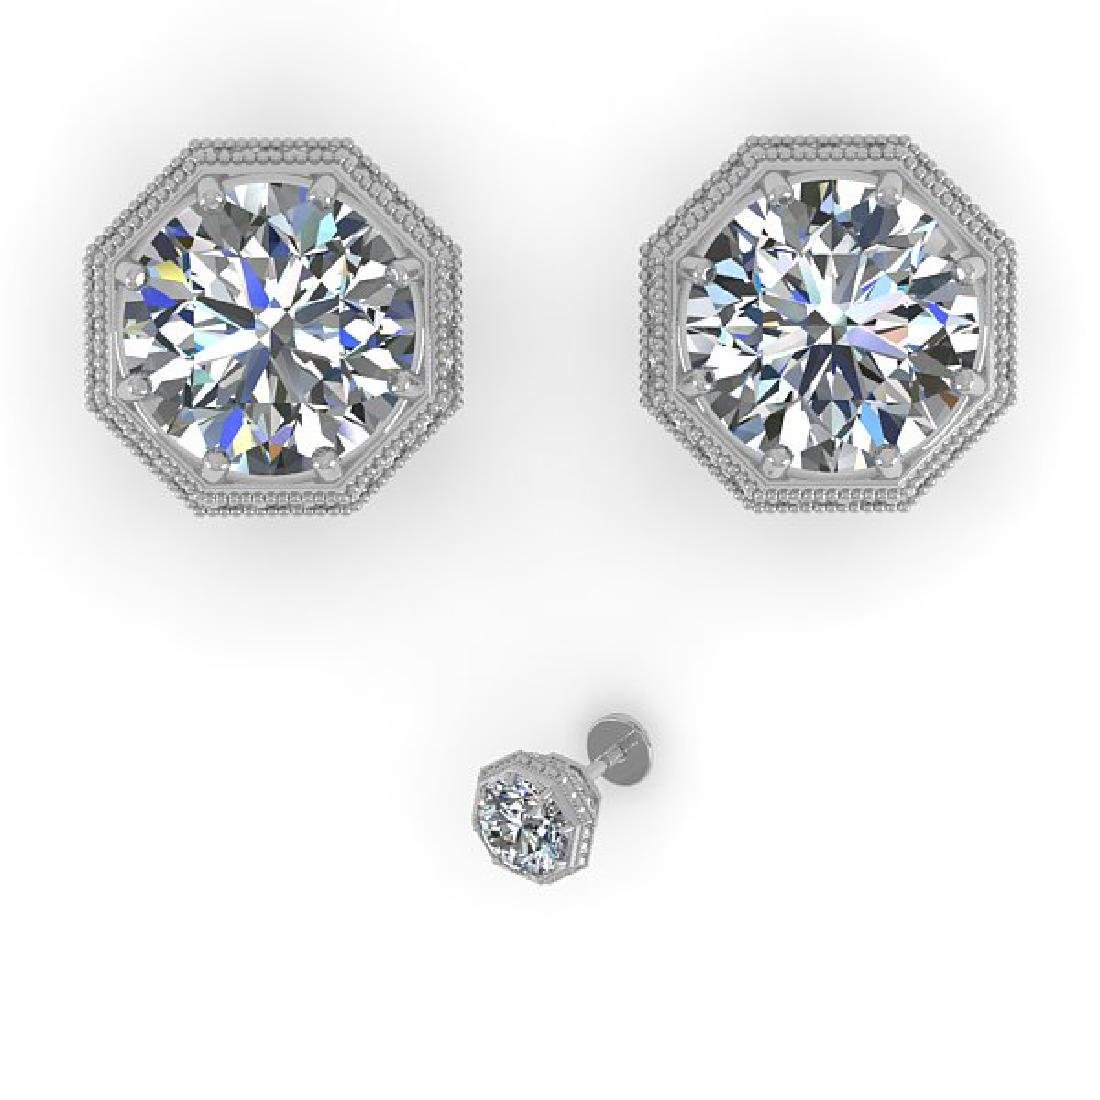 2.0 CTW VS/SI Diamond Stud Solitaire Earrings 14K White - 2